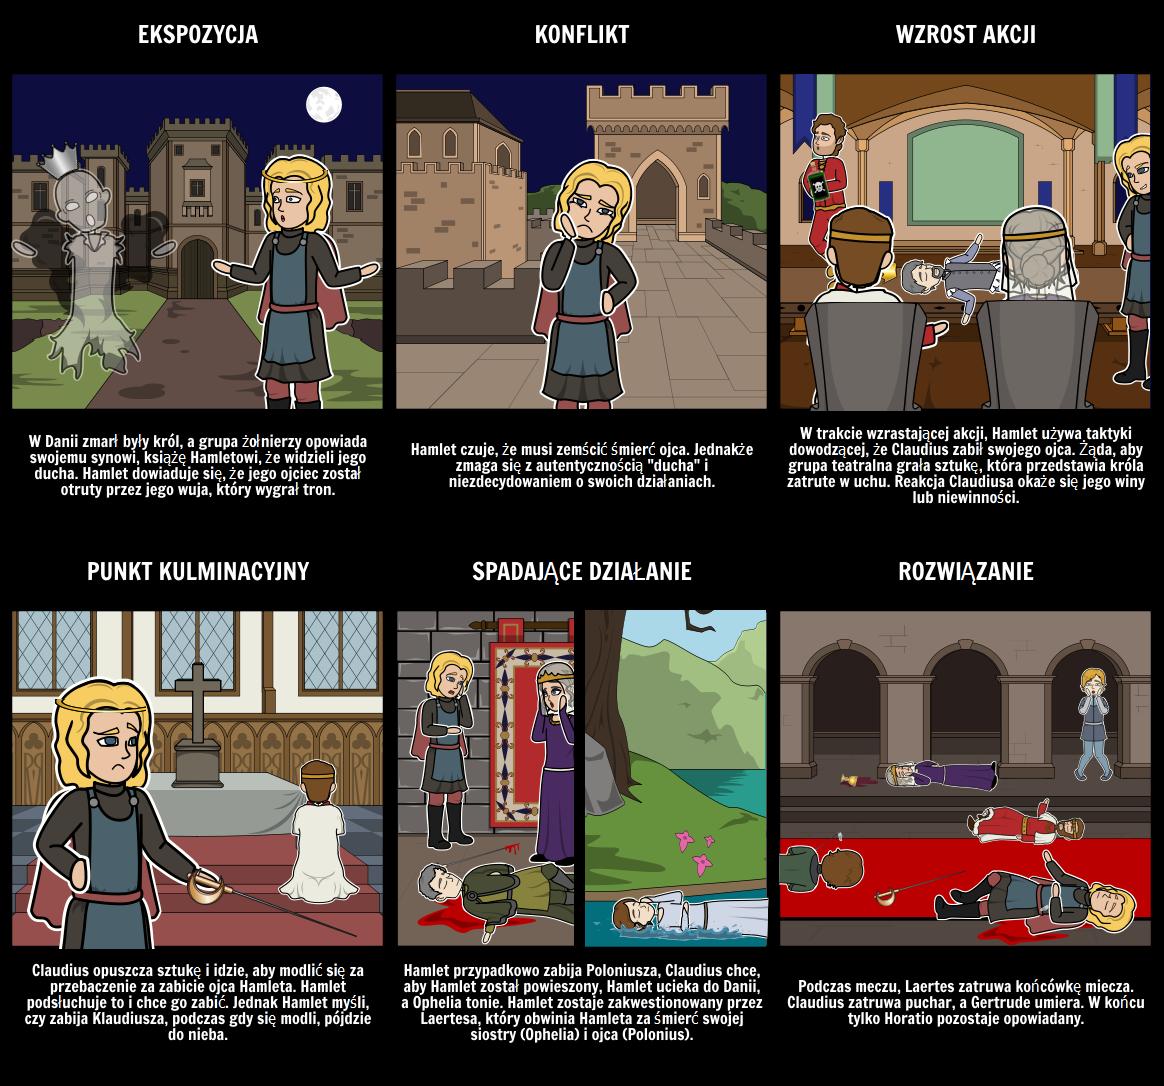 Struktura Akt Hamleta